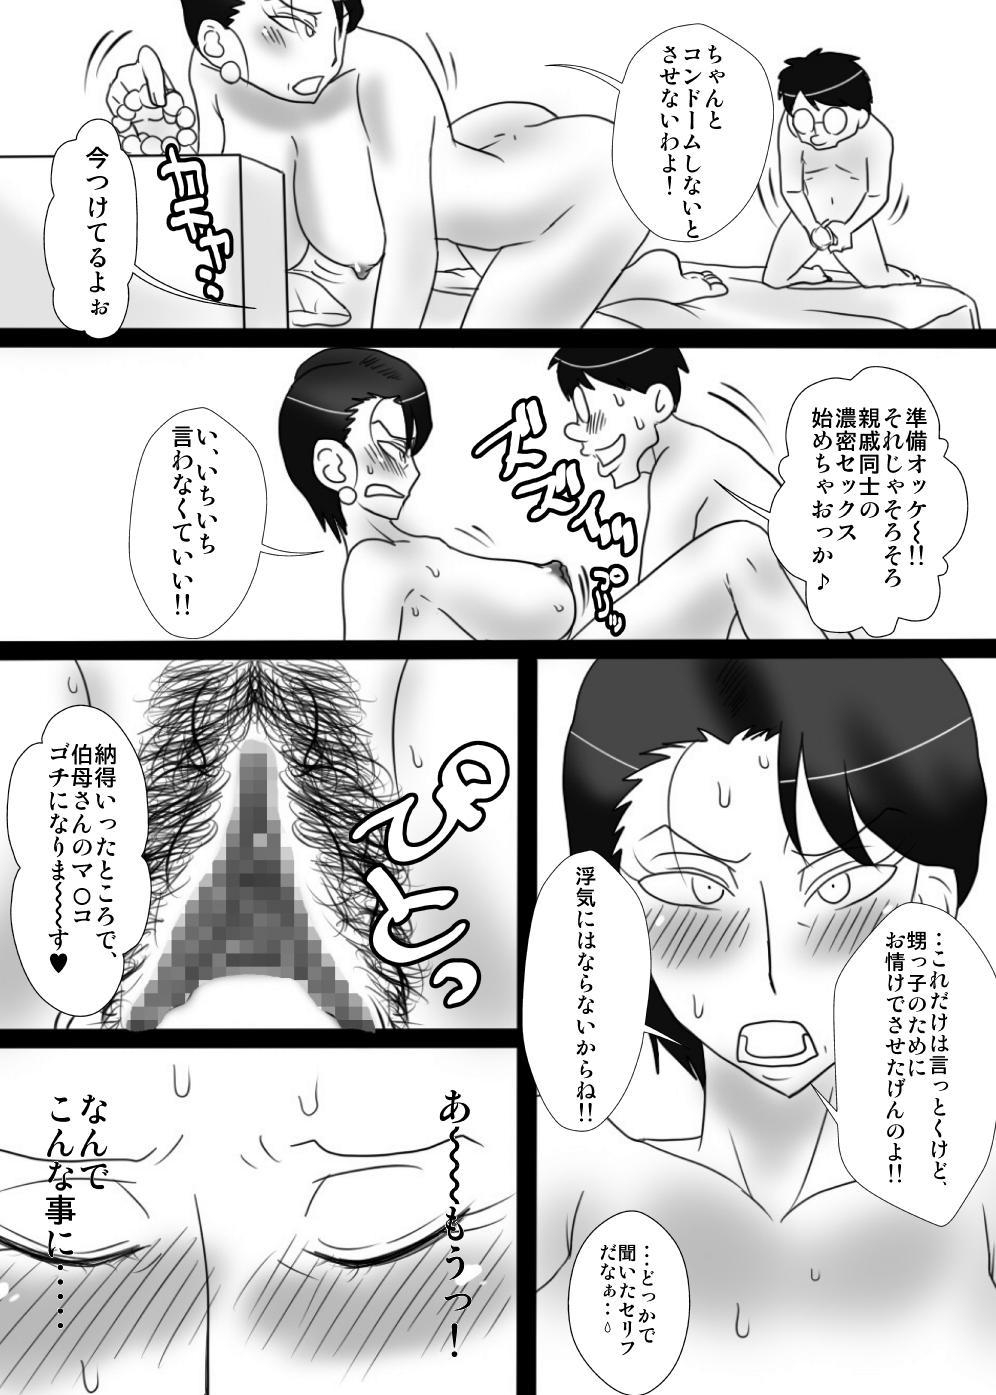 Oba-san o Otosuze! 21